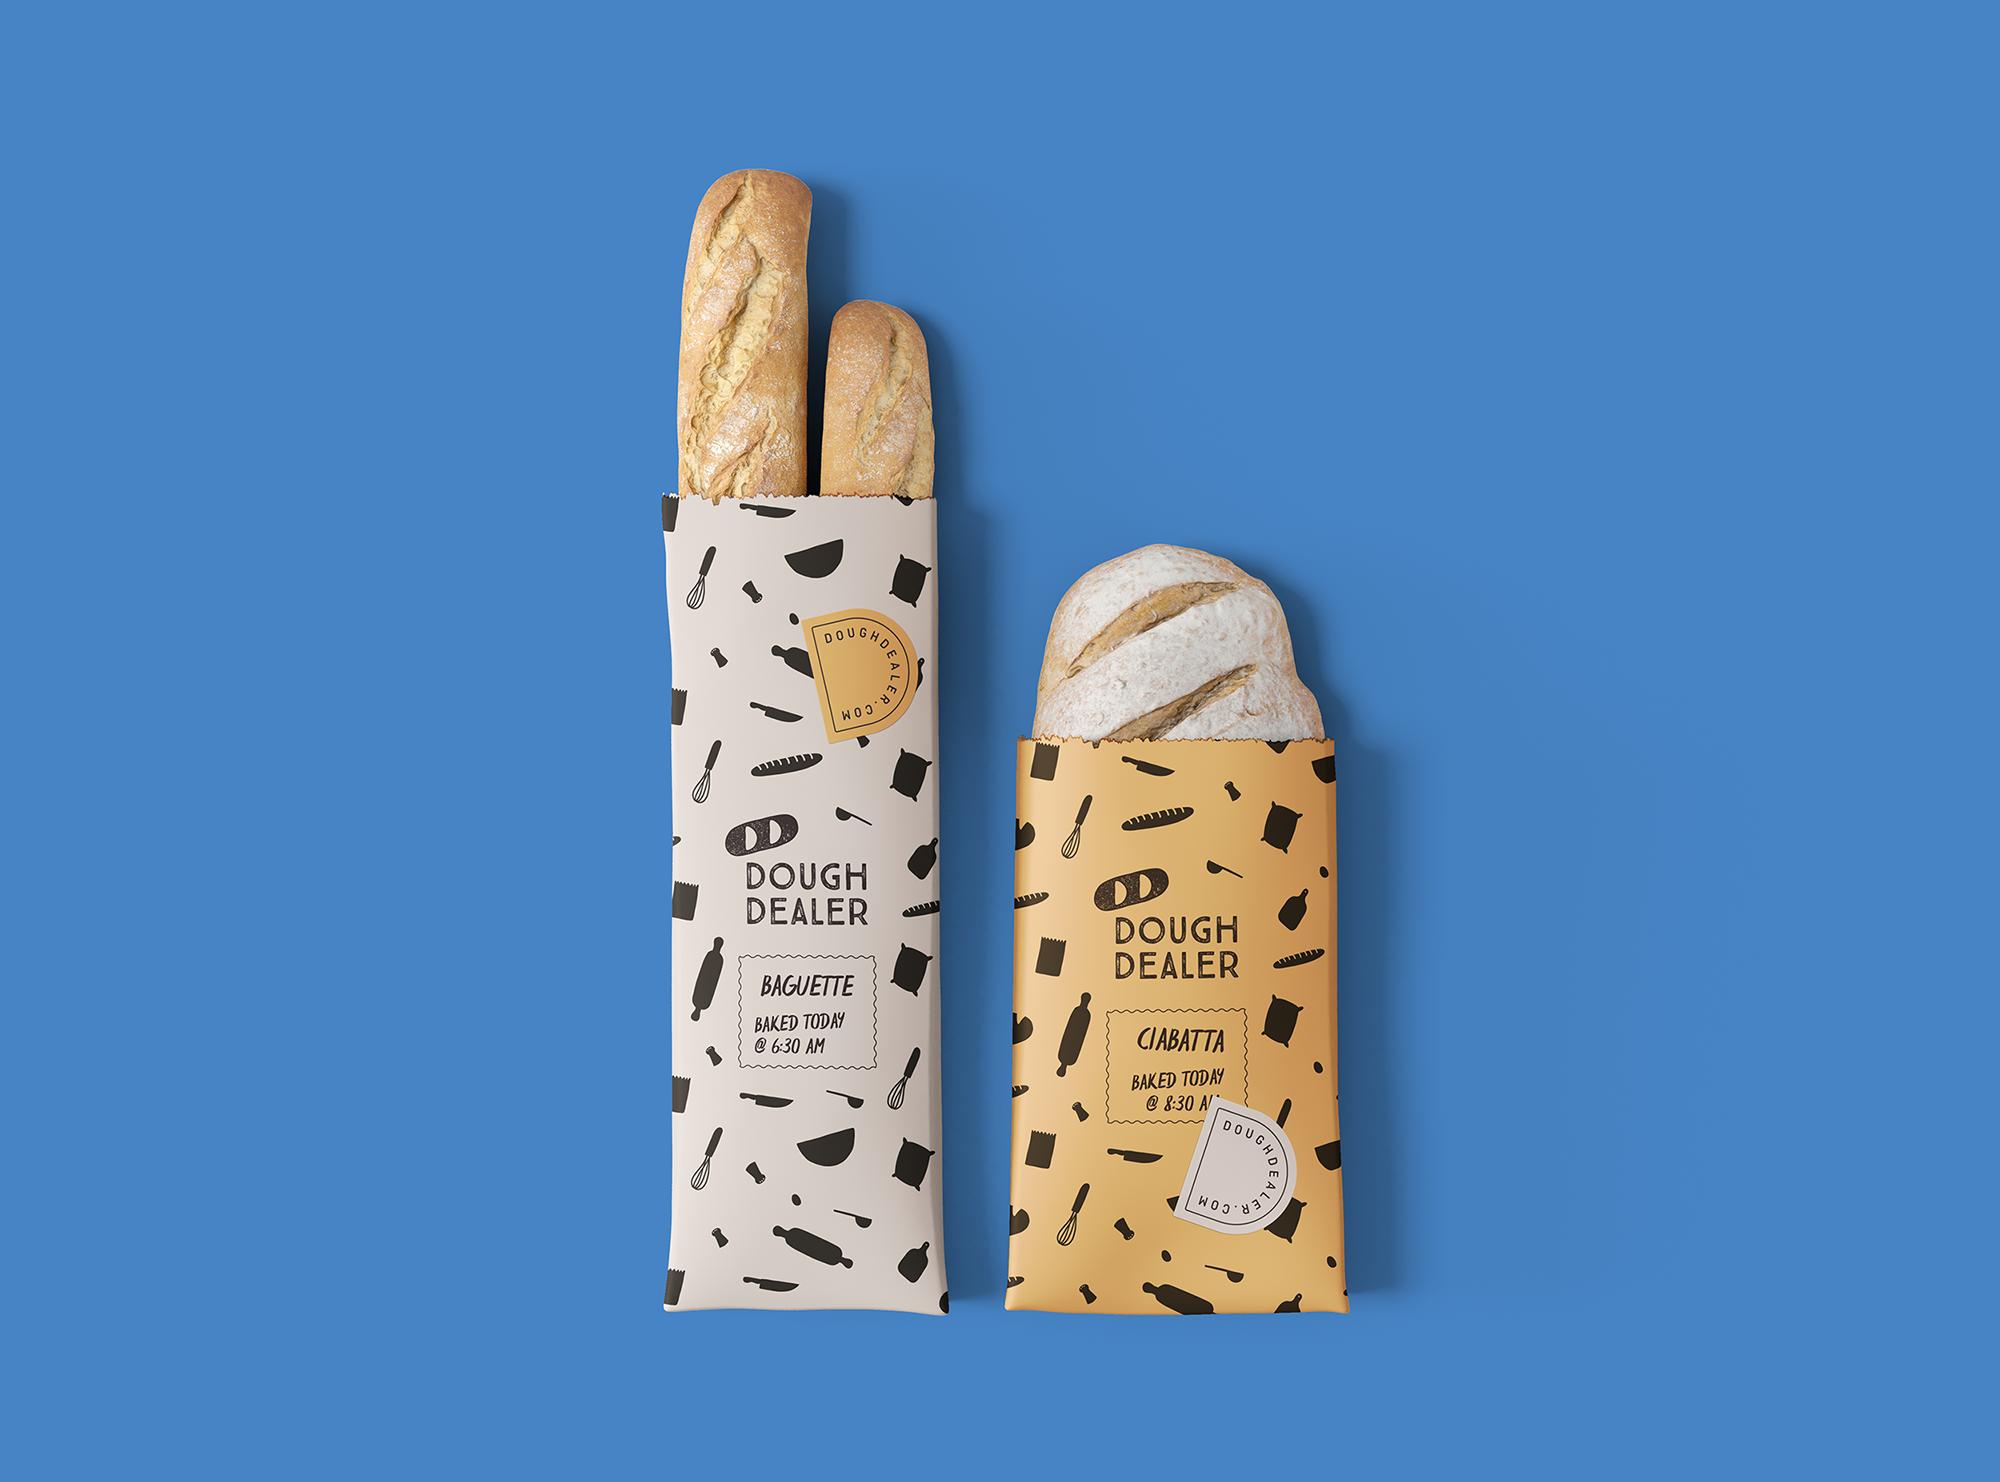 Dough Dealer Gets Bold and Fun Visual Identity by Borondo